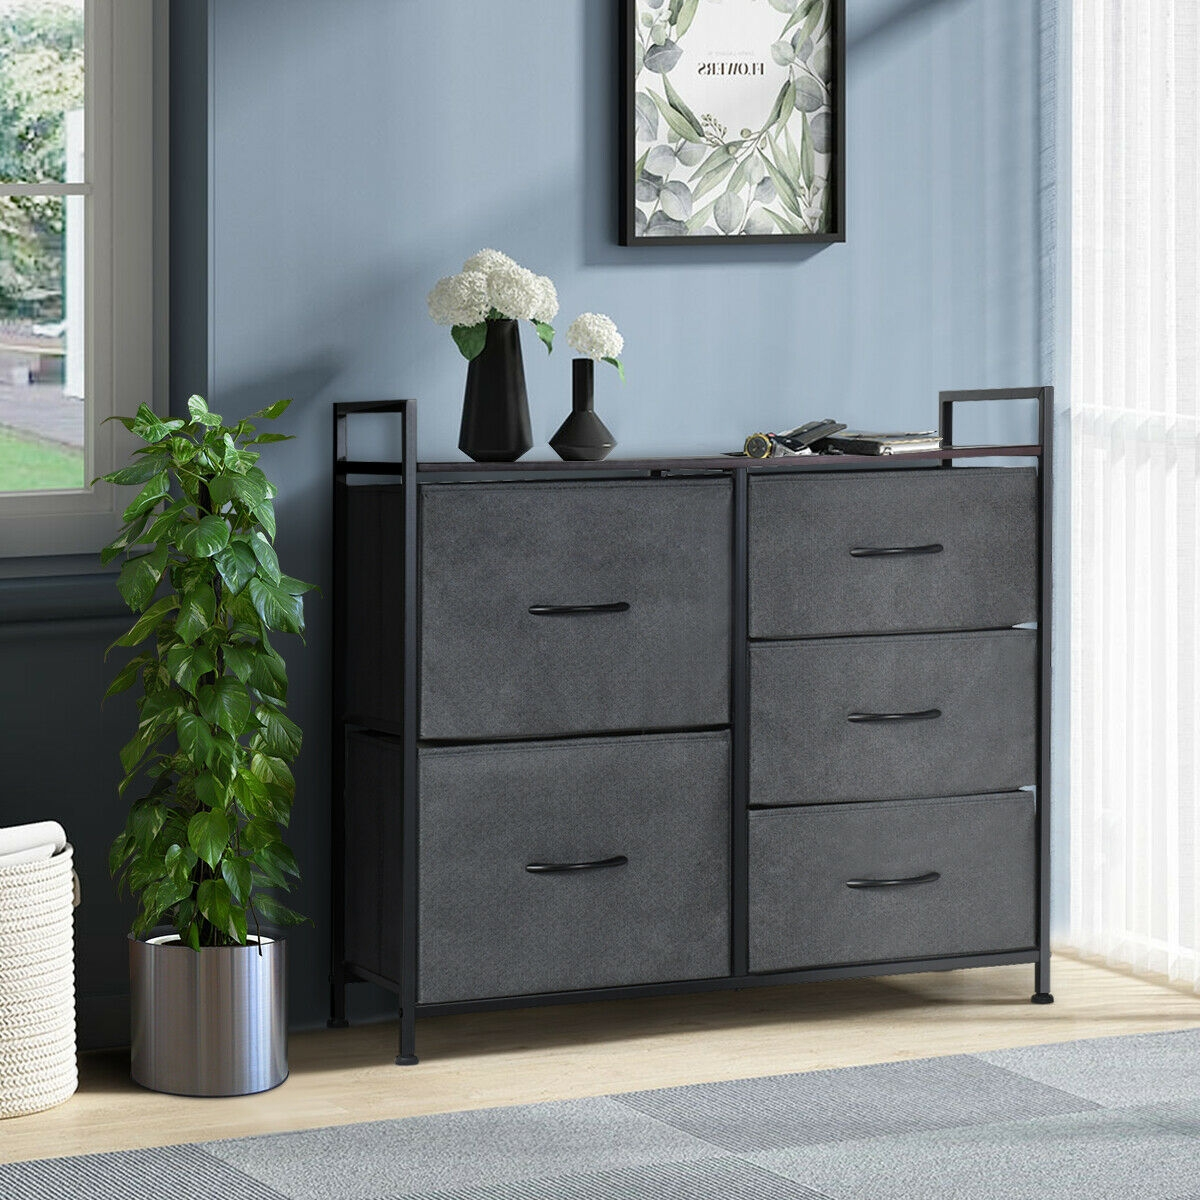 5 Drawers Room Wood Dresser Storage Side Table Display Organizer